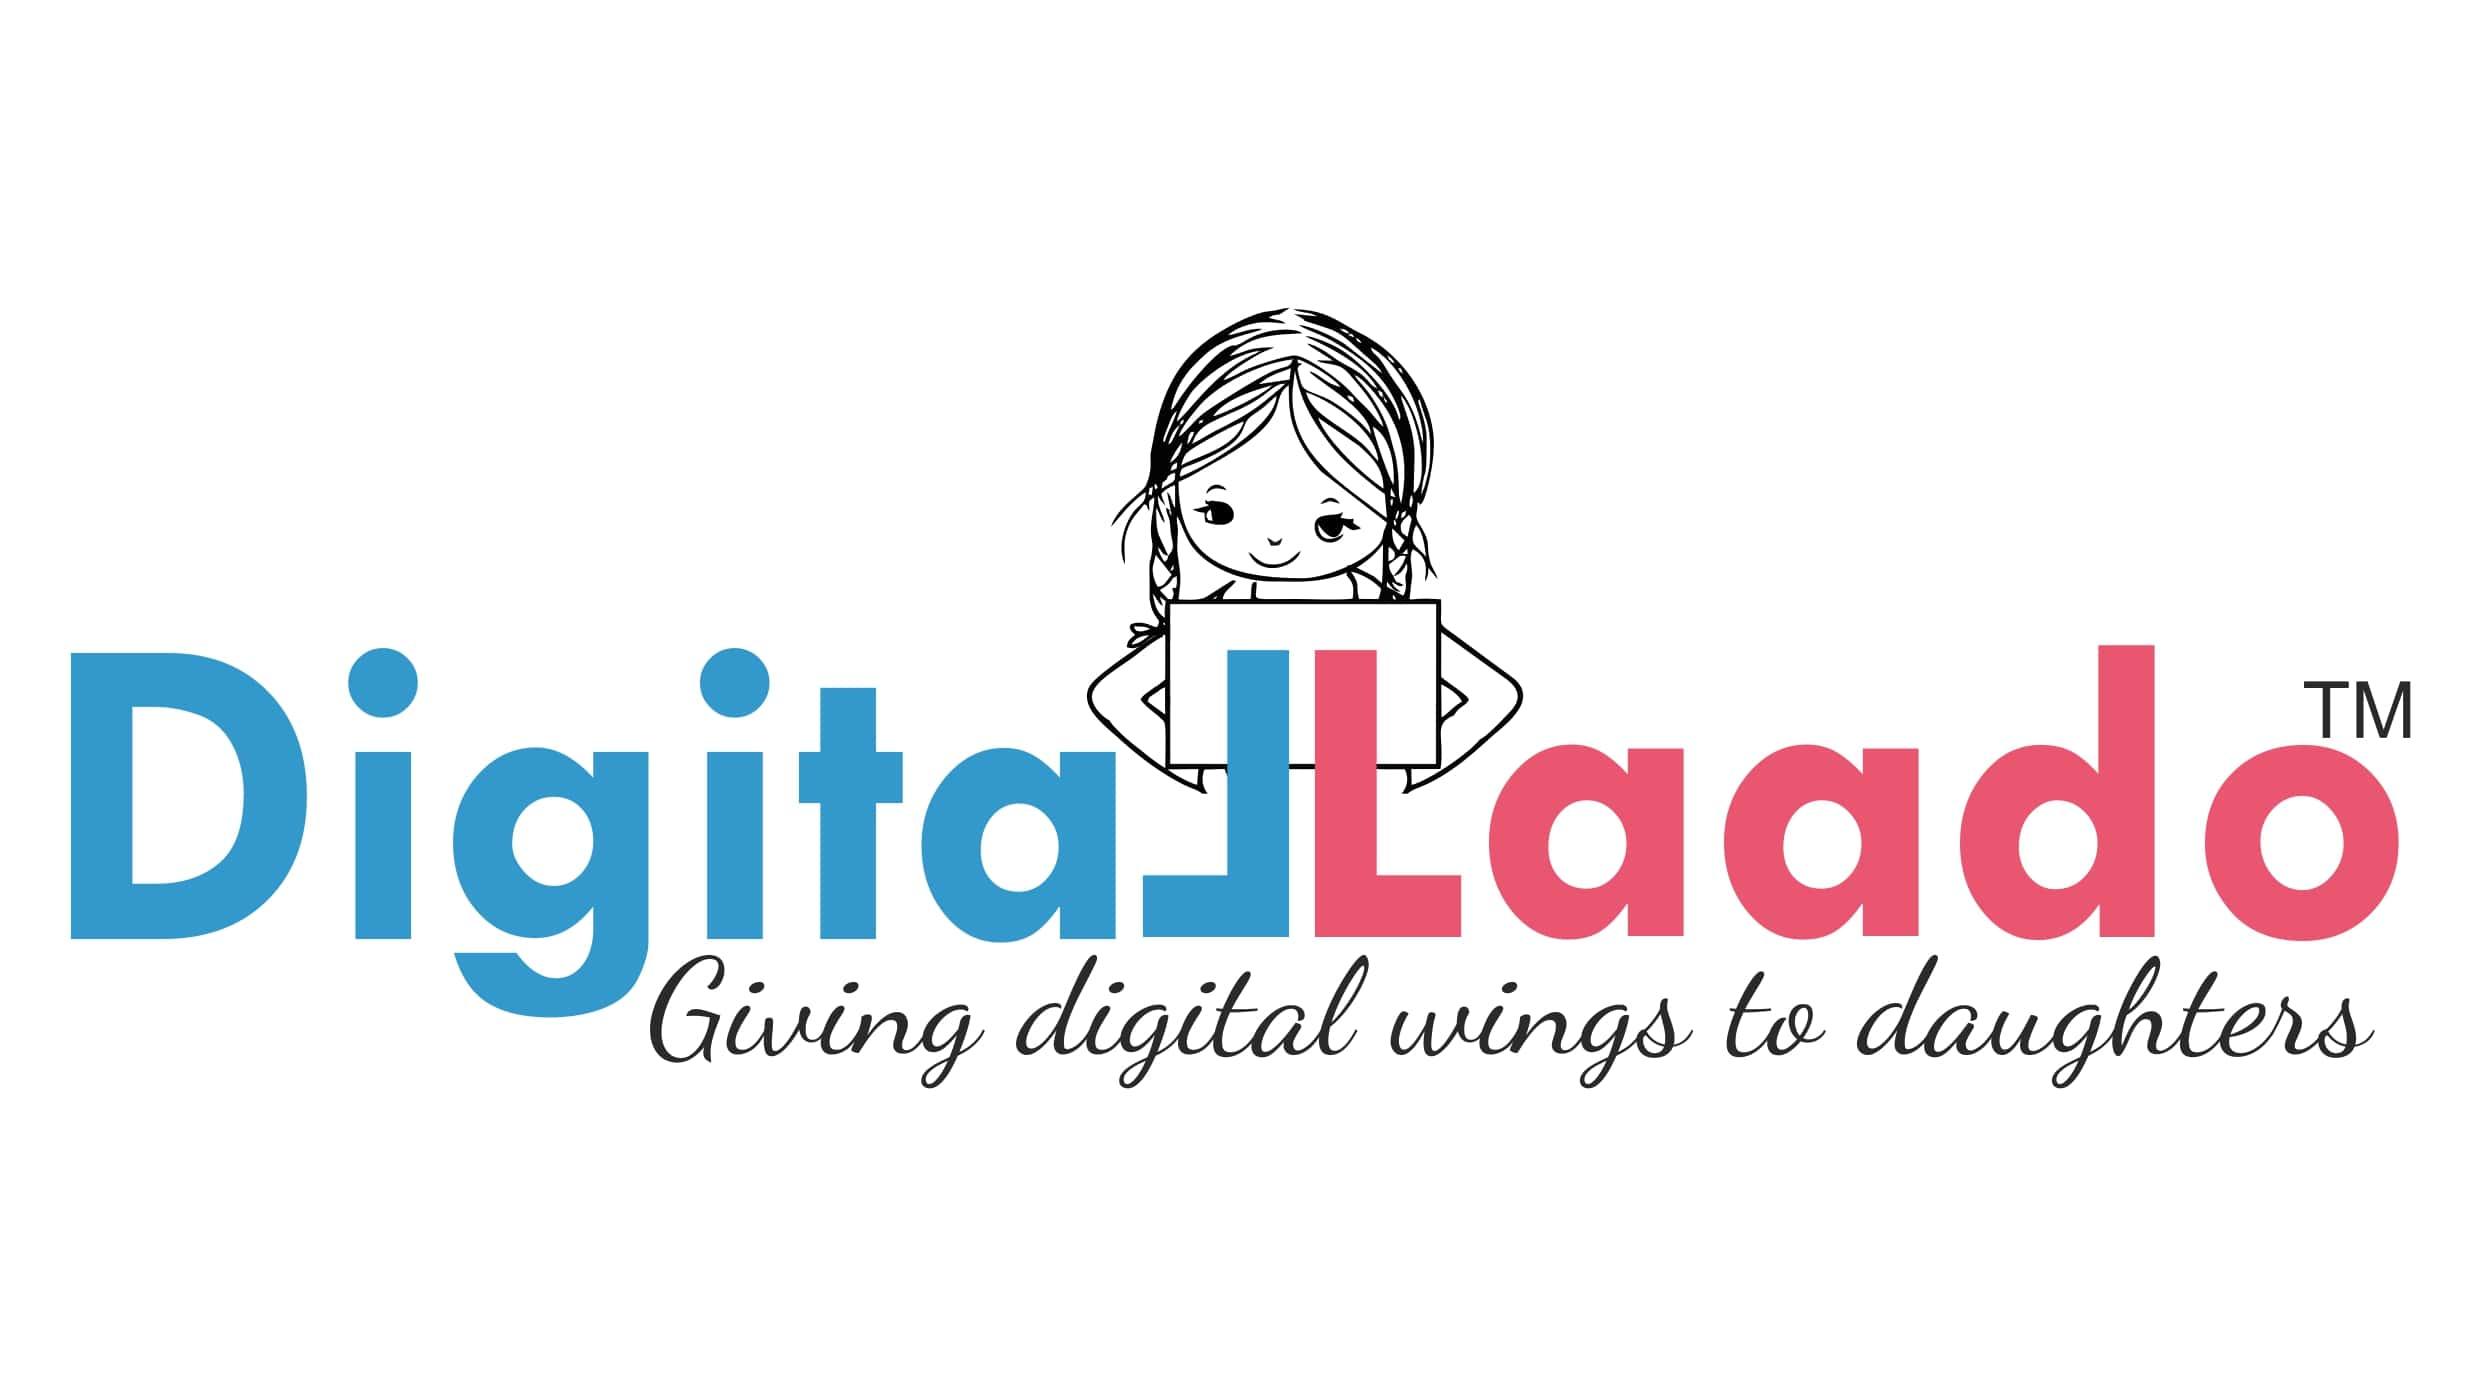 Digital Laado Logo